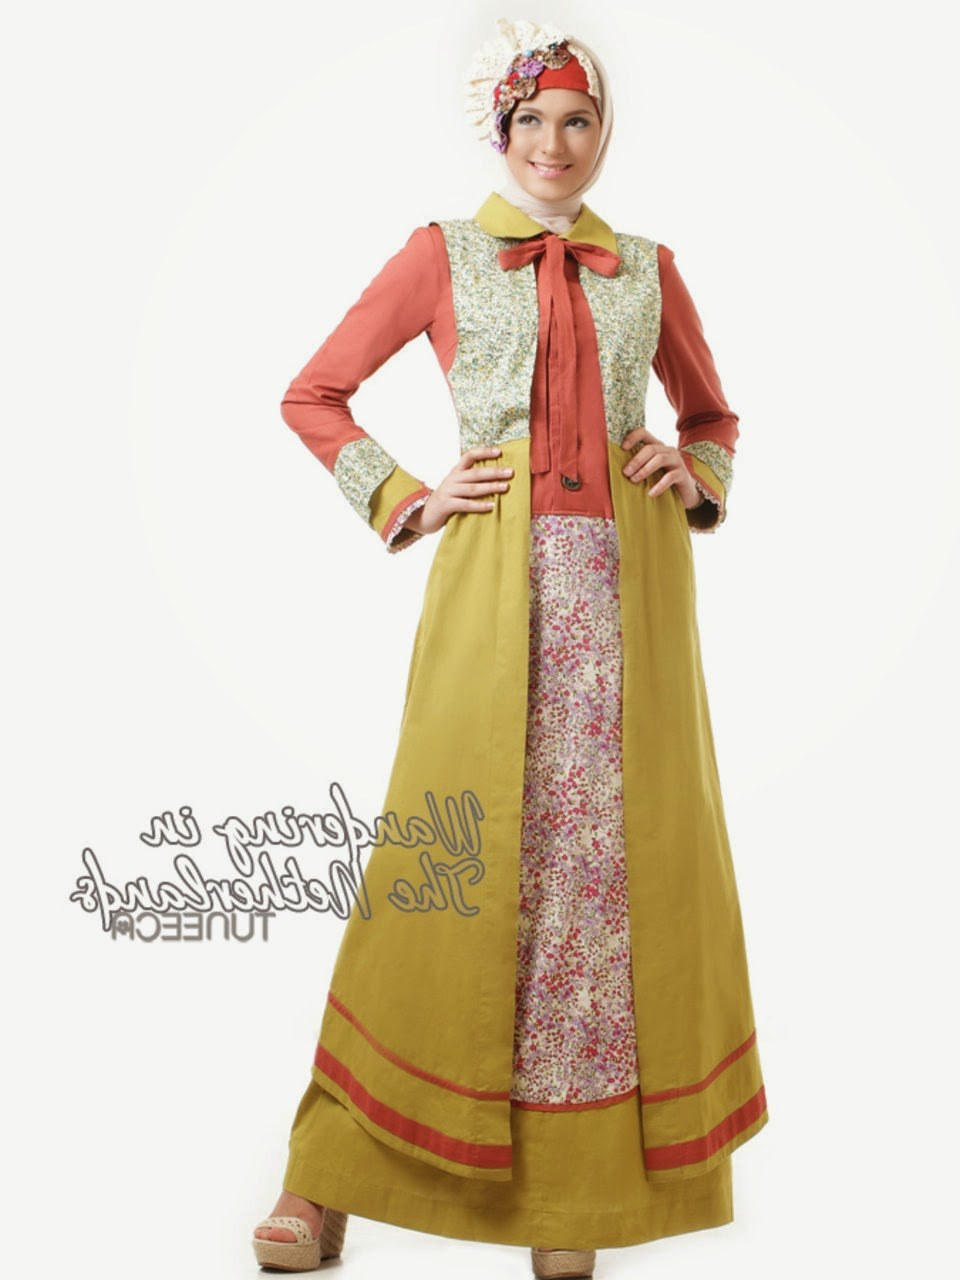 Inspirasi Contoh Baju Lebaran Zwdg 12 Contoh Model Gamis Muslim Lebaran Terbaru Kumpulan